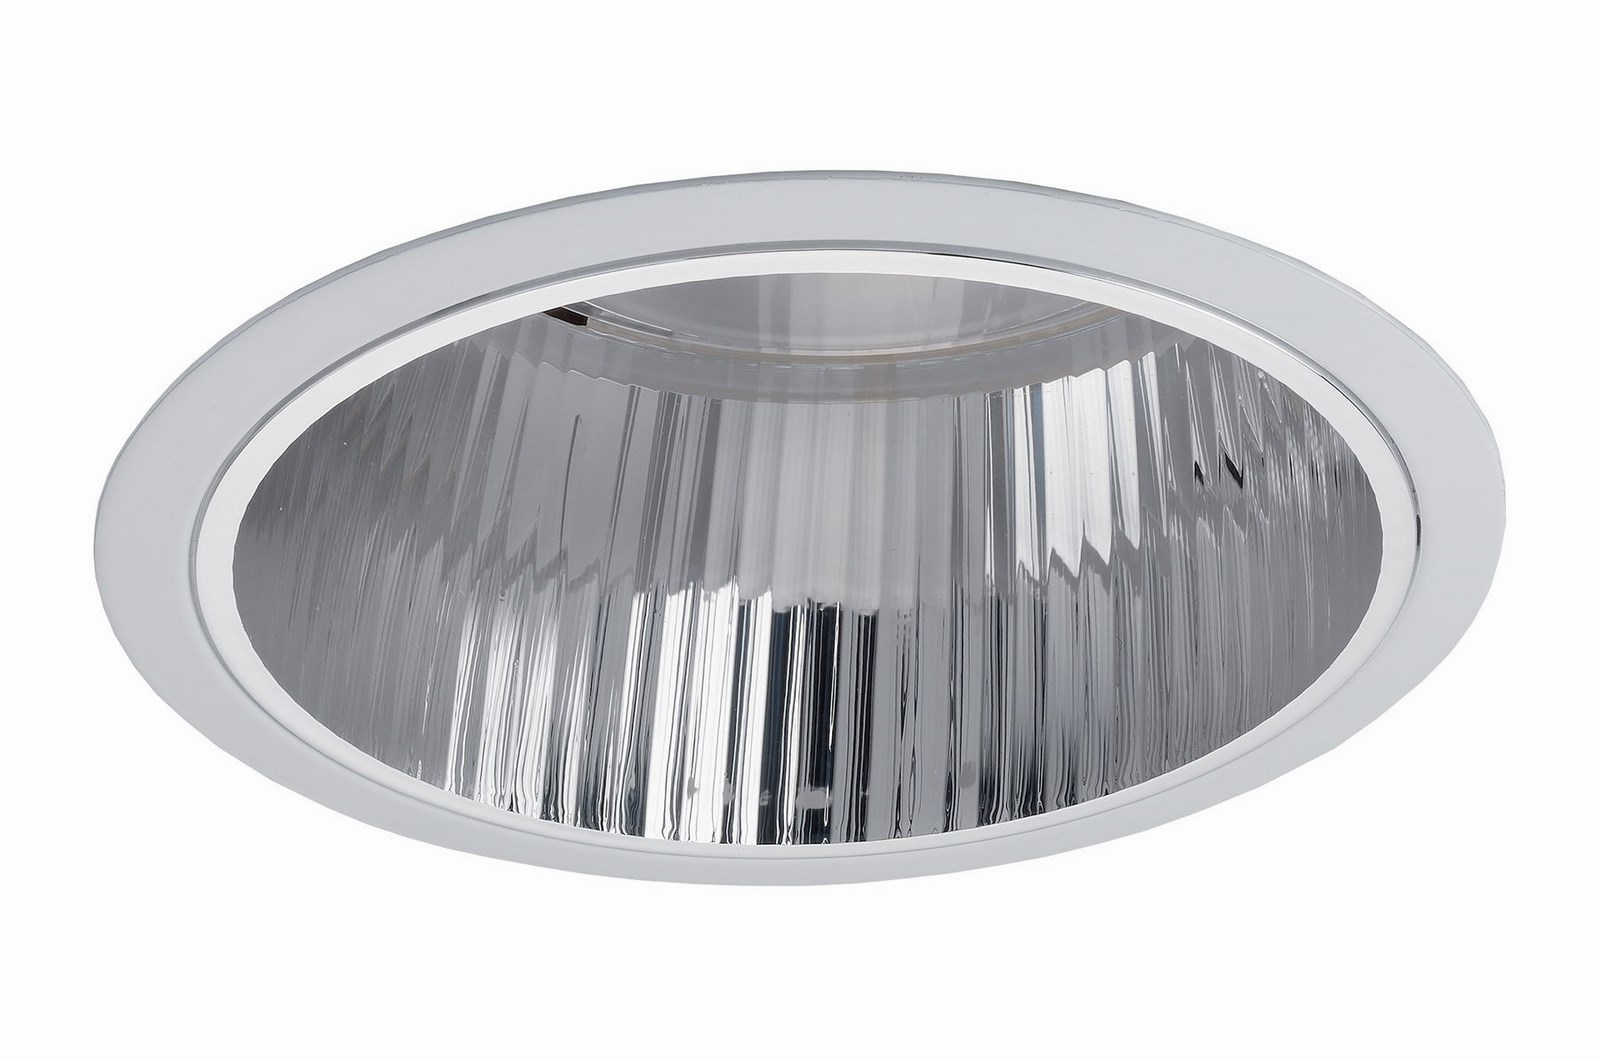 Convecteur Salle De Bain Sylvania ~ luminaires lumiance lumiance encastres insaver